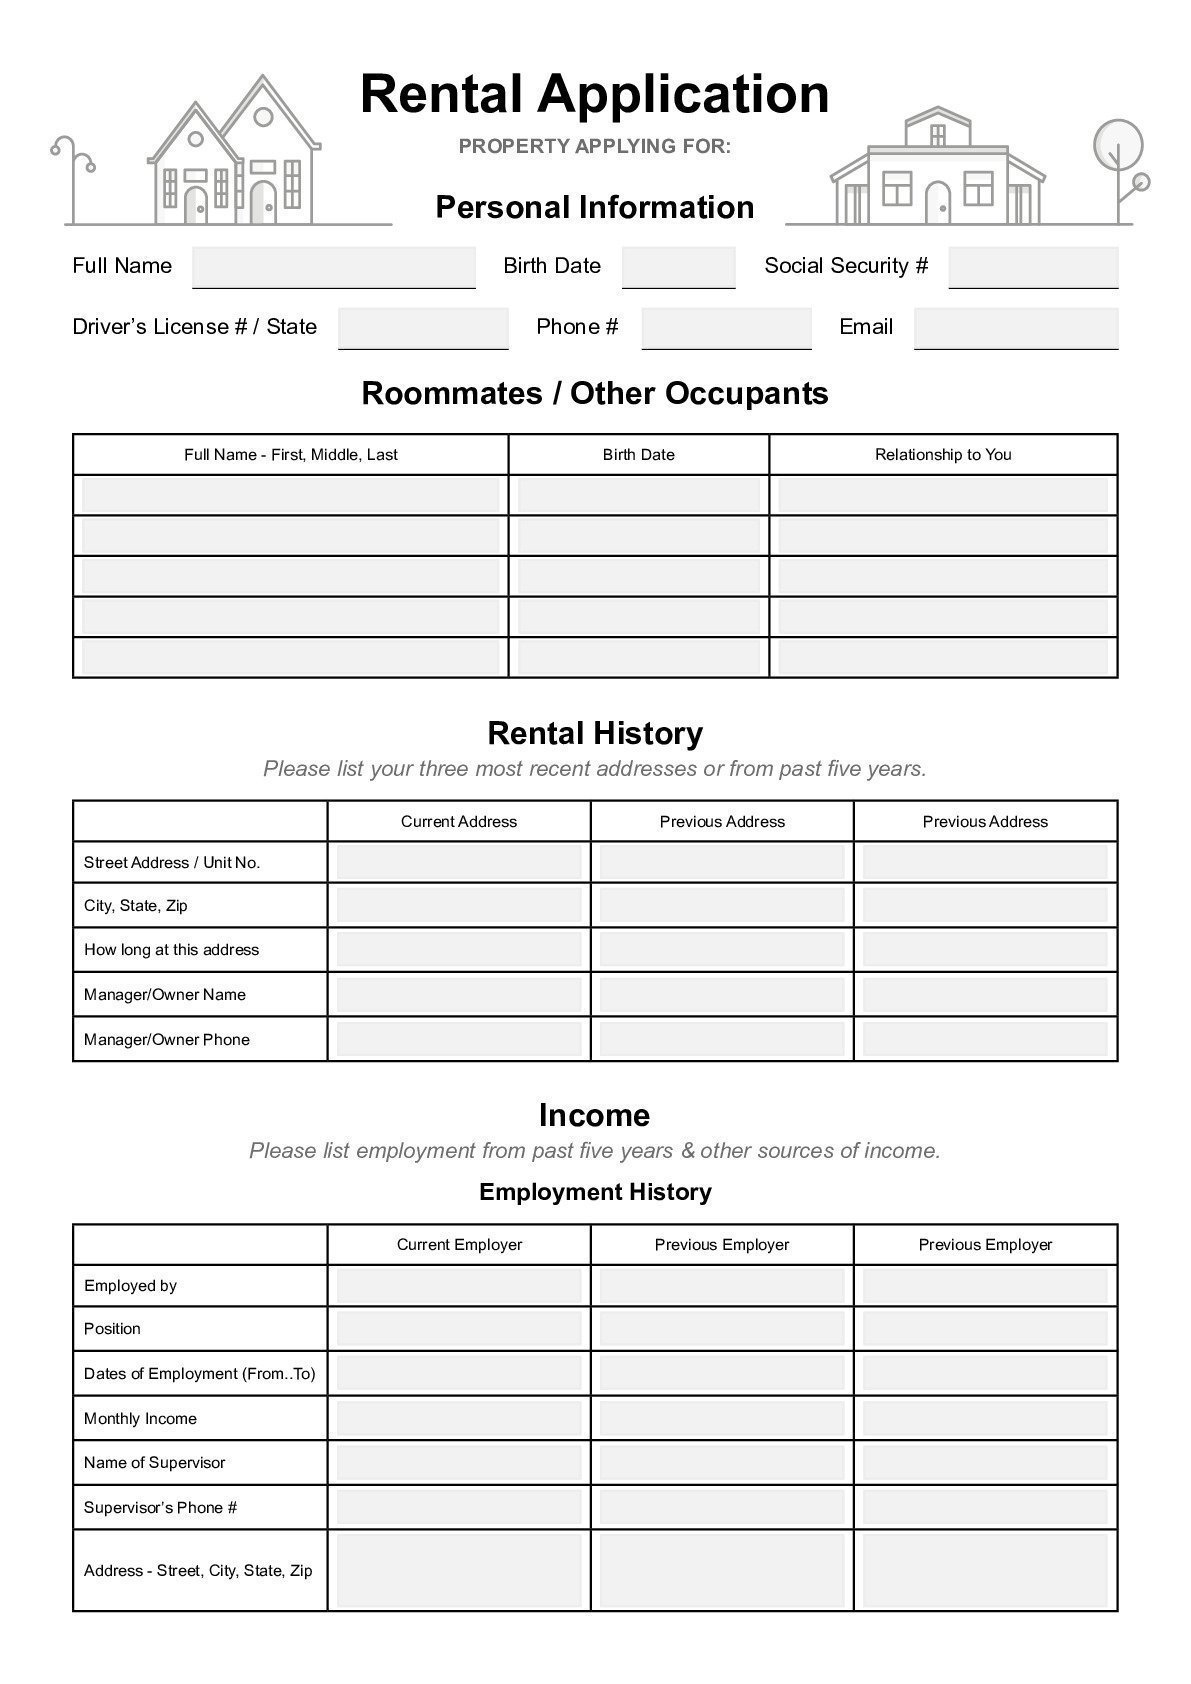 Rental Application Form Template  sample